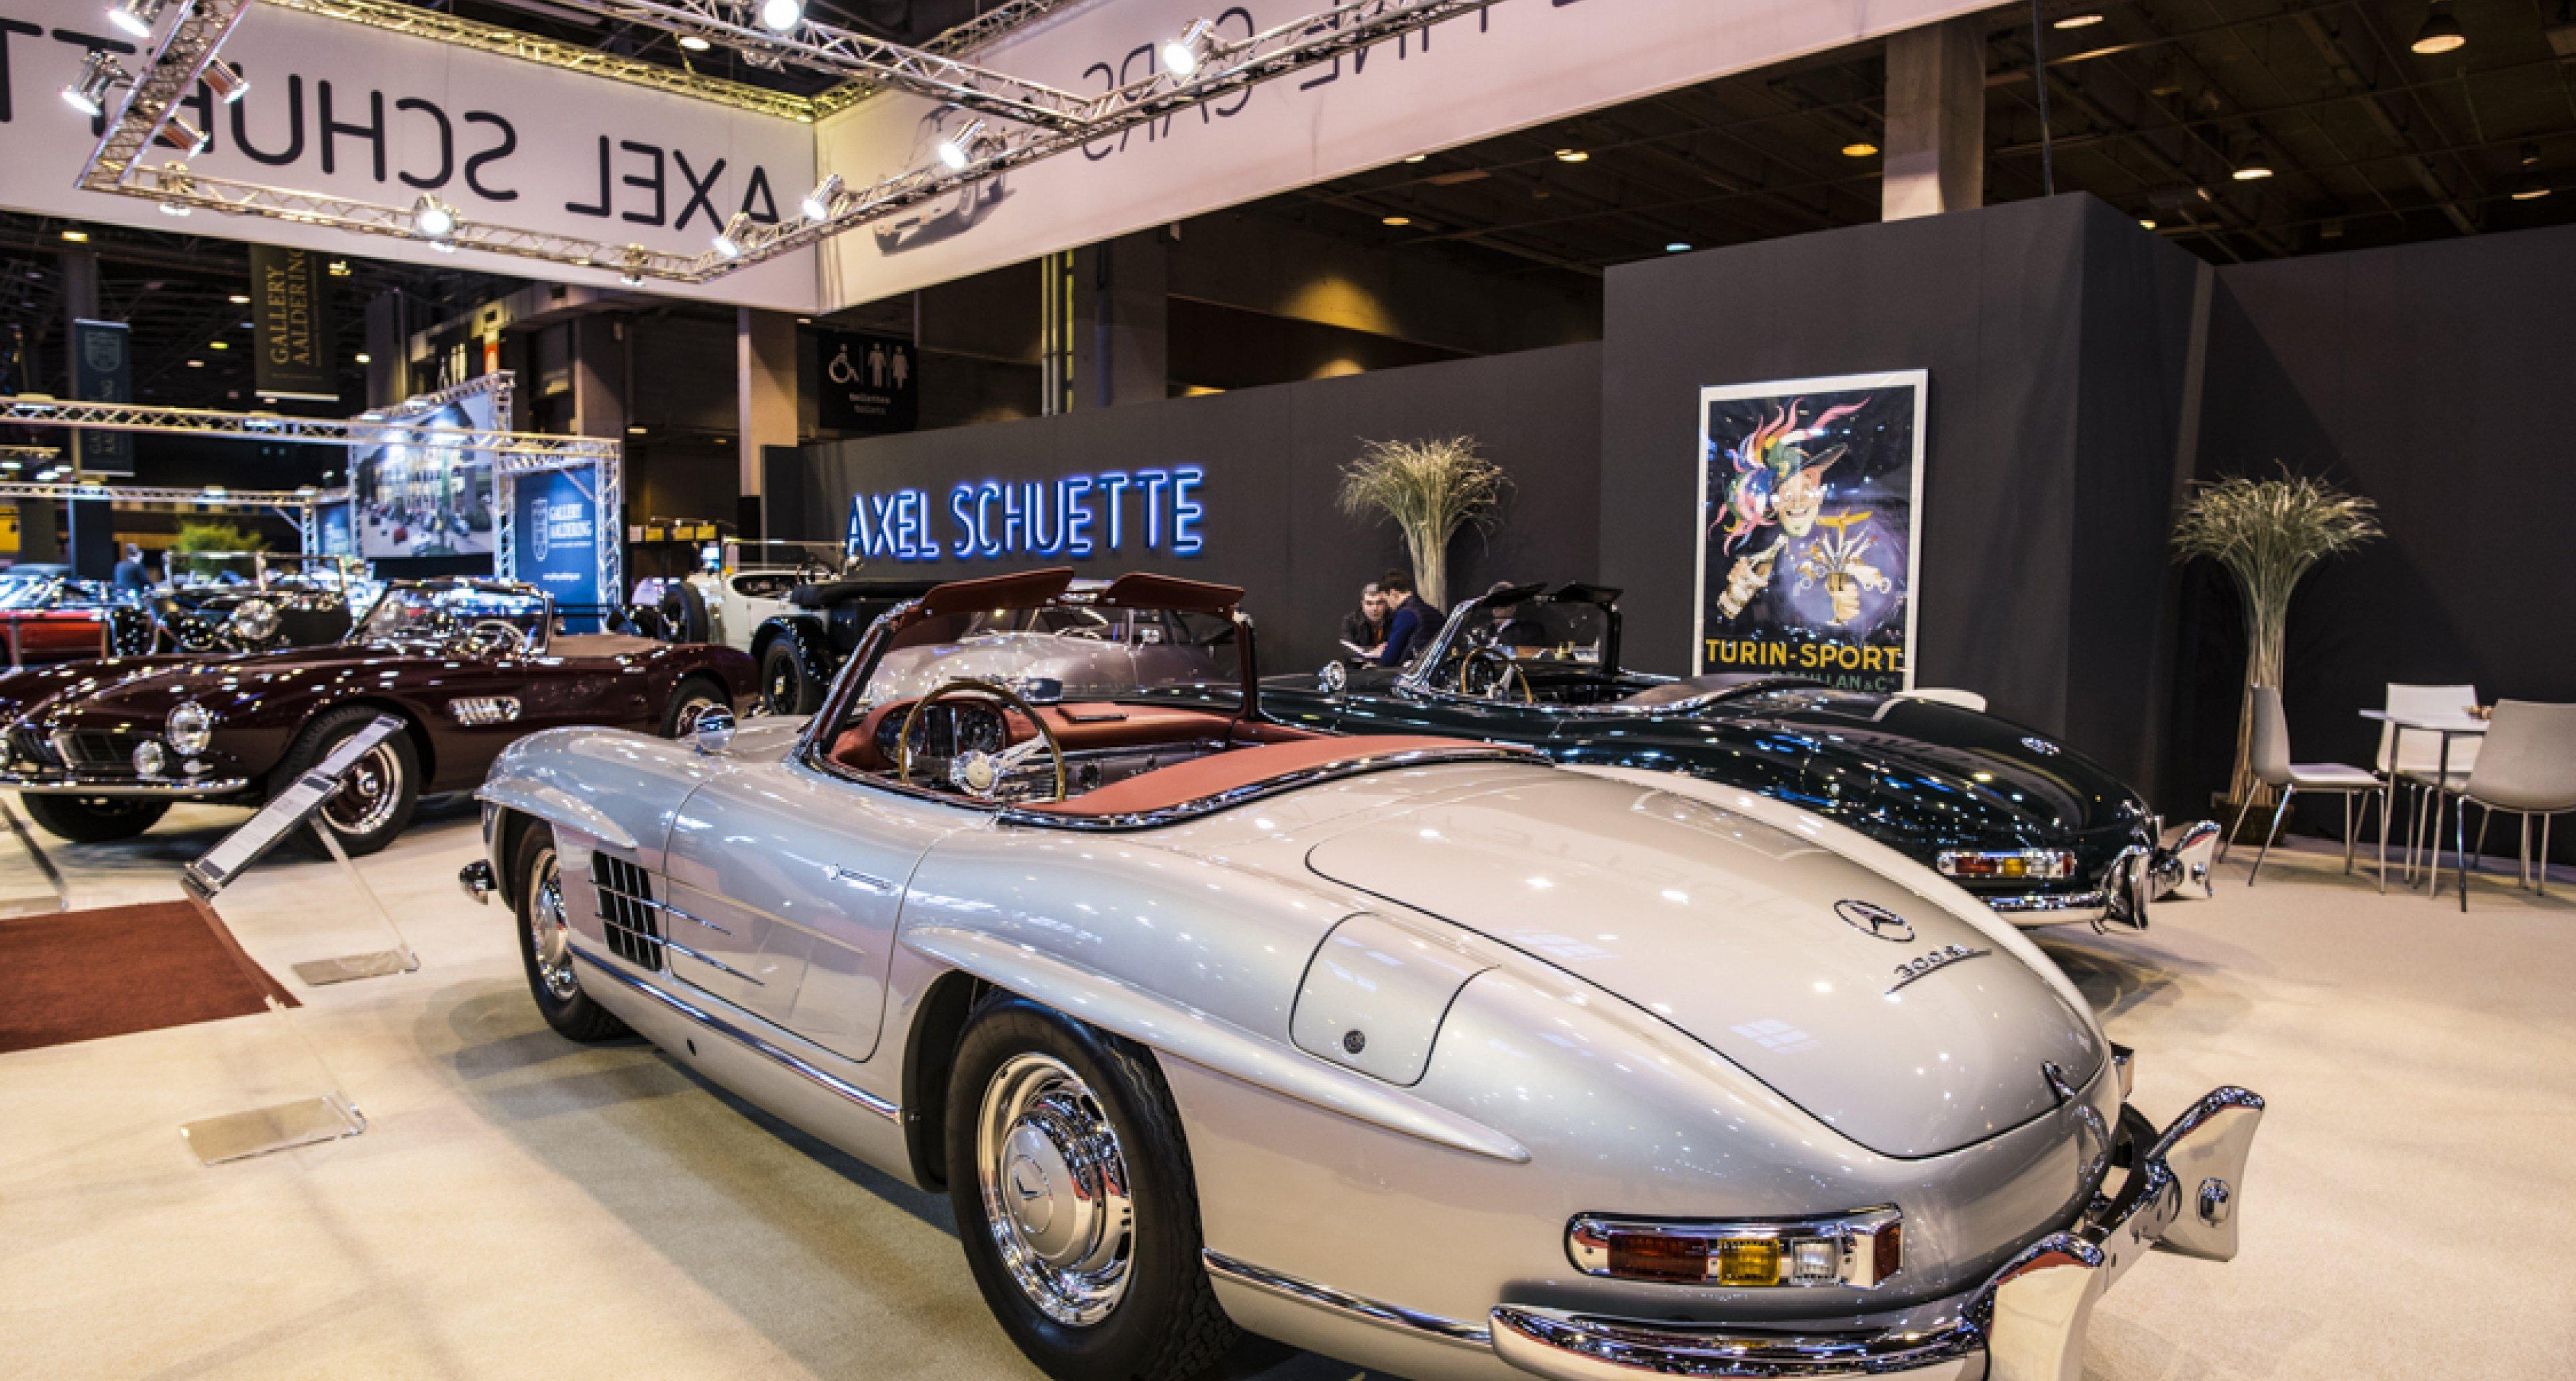 Axel Schuette Fine Cars GmbH & Co. KG